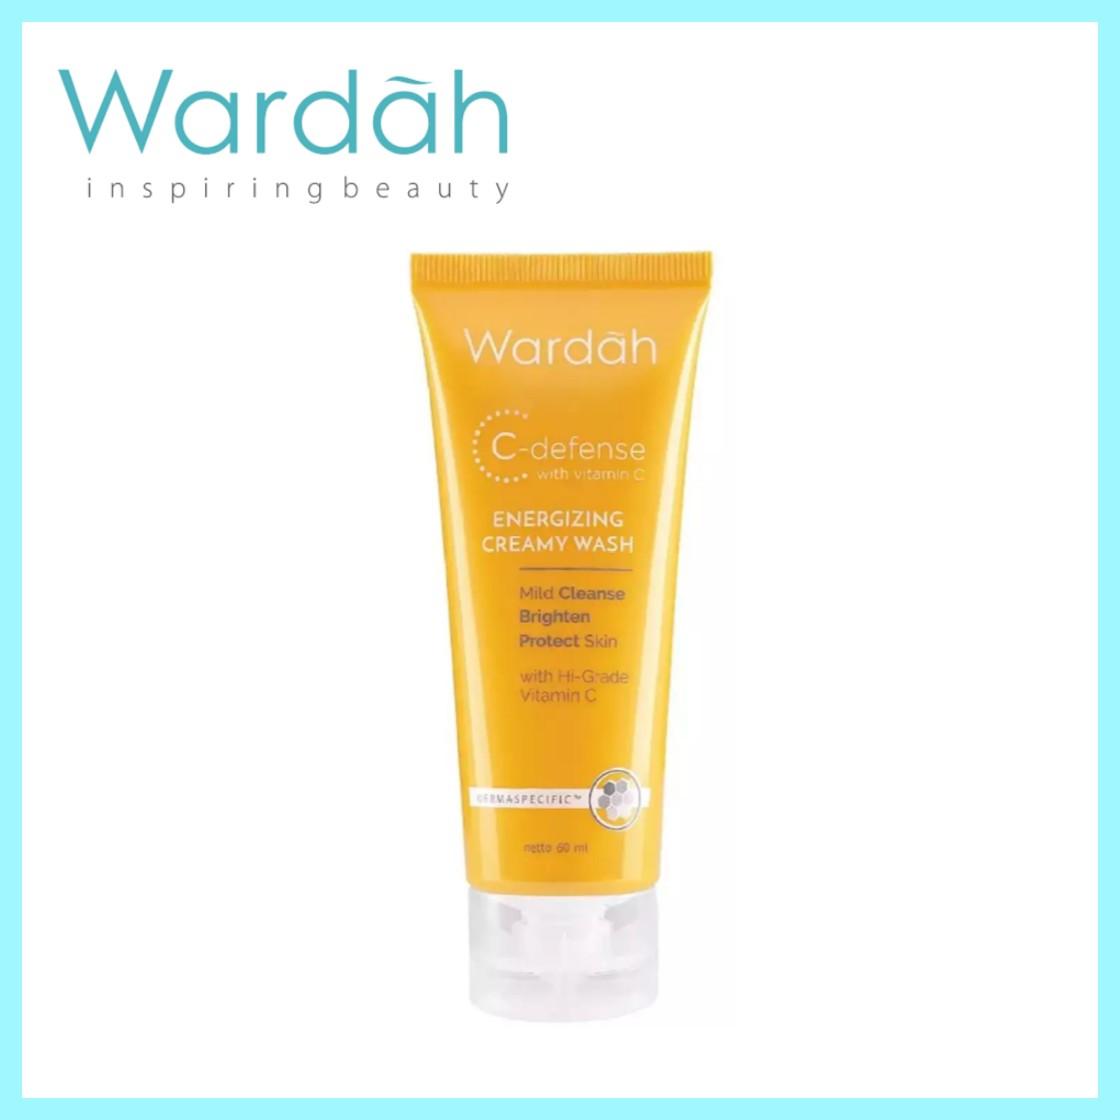 Wardah Energizing Creamy Wash 60ml-100ml C-Defense